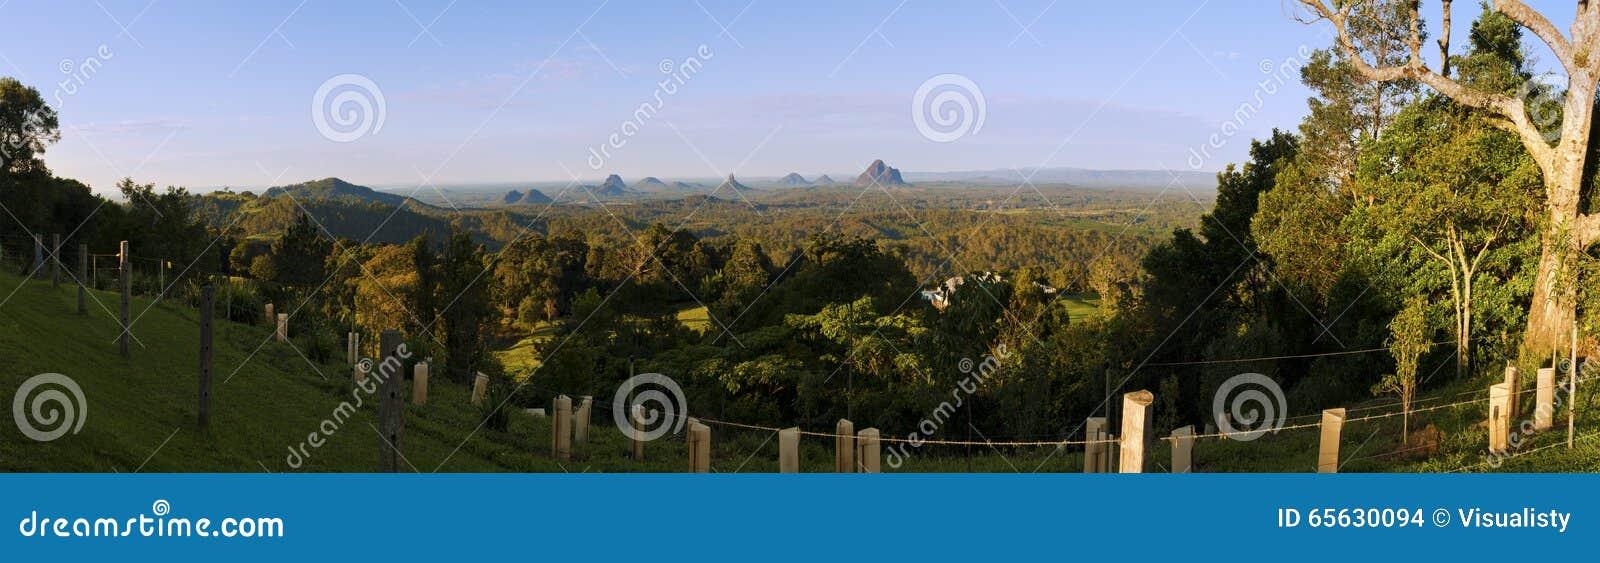 Panorama de montagnes de serre